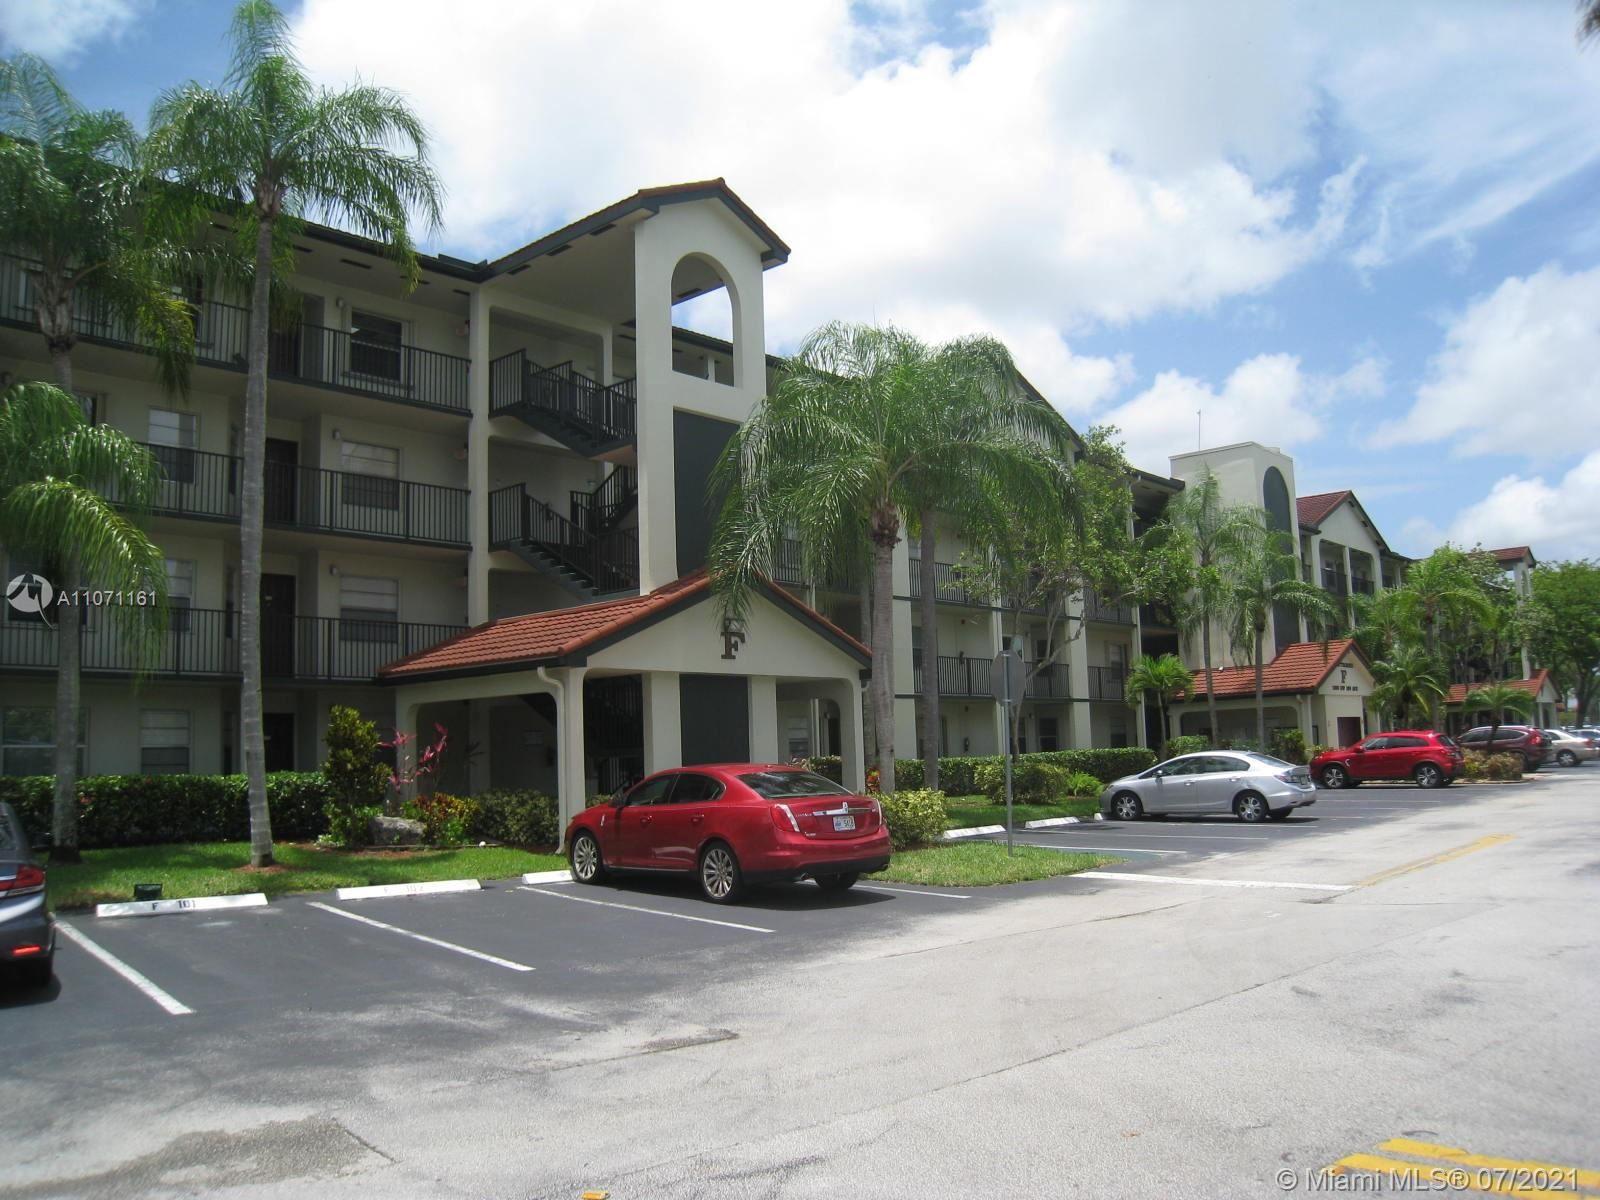 1300 SW 130th Ave #408F, Pembroke Pines, FL 33027 - #: A11071161